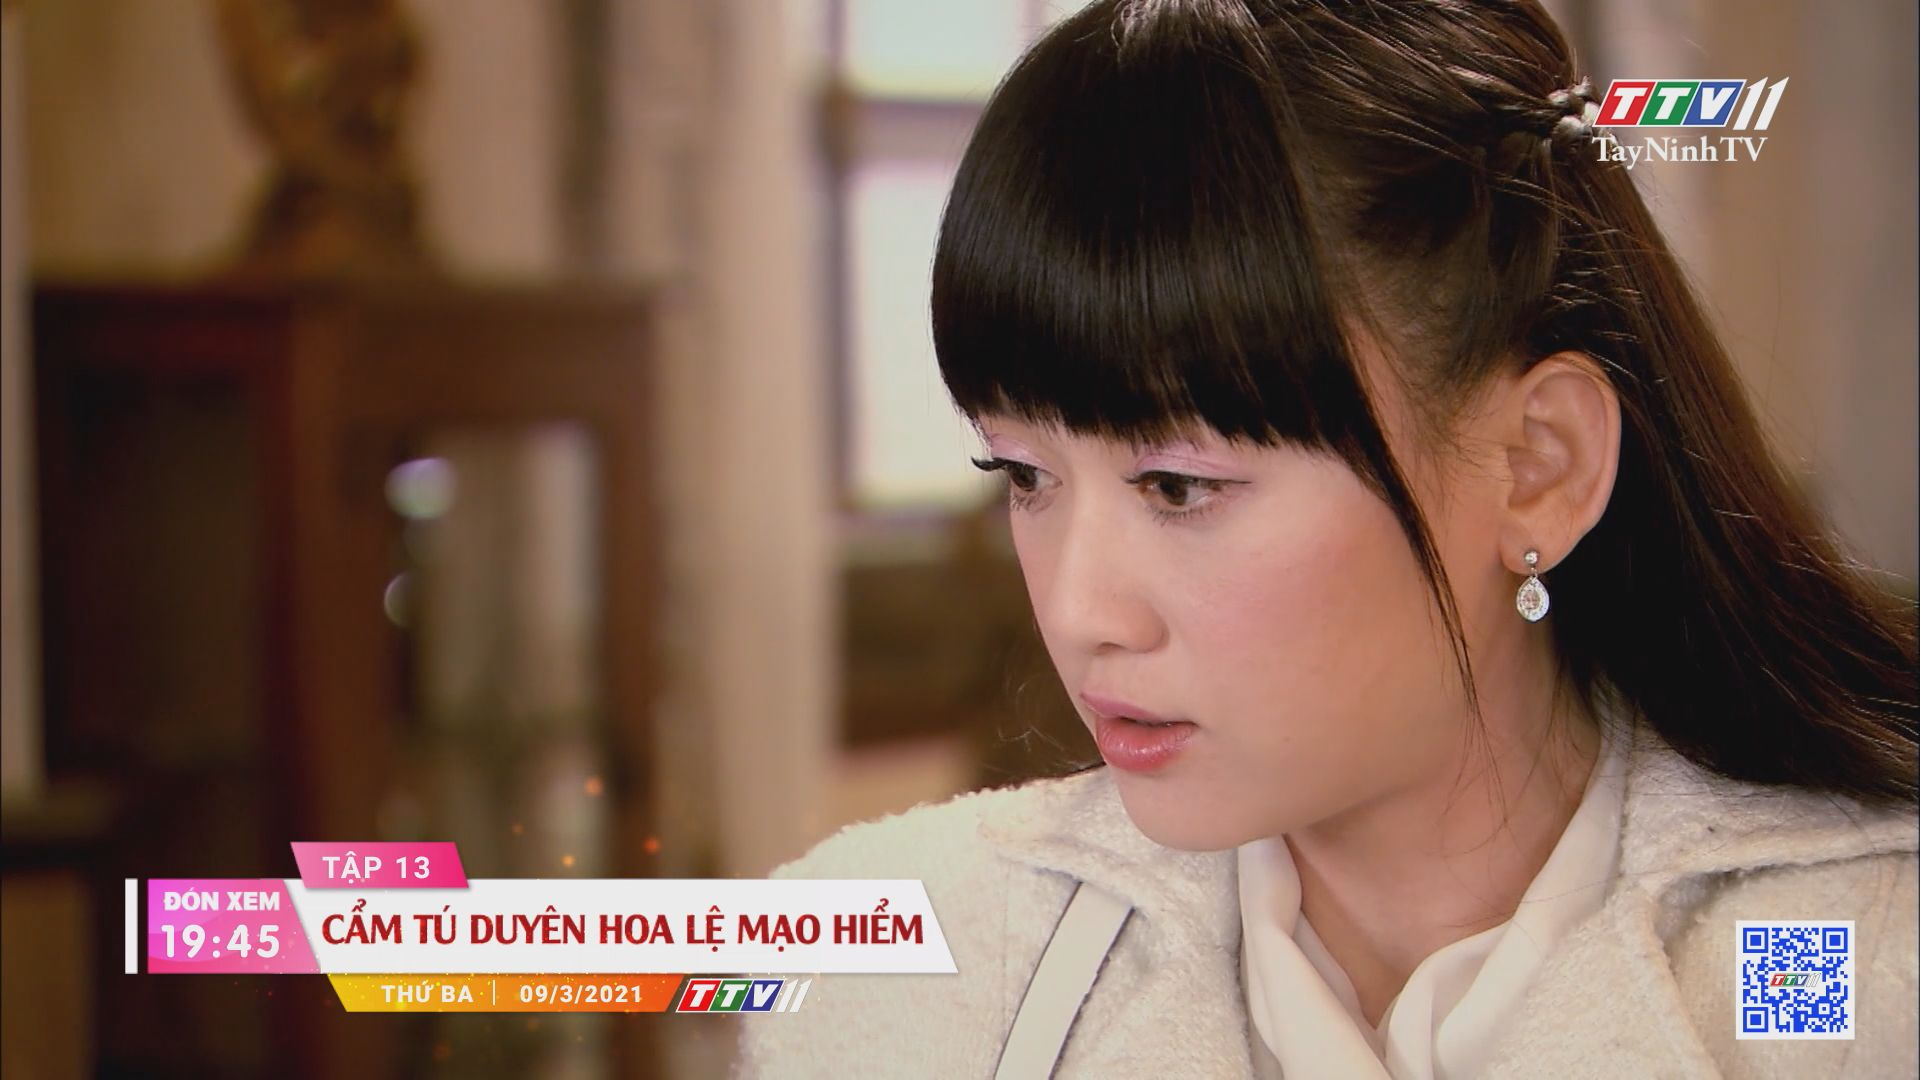 Cẩm Tú duyên hoa lệ mạo hiểm-Trailer tập 13 | PHIM CẨM TÚ DUYÊN HOA LỆ MẠO HIỂM | TayNinhTVE